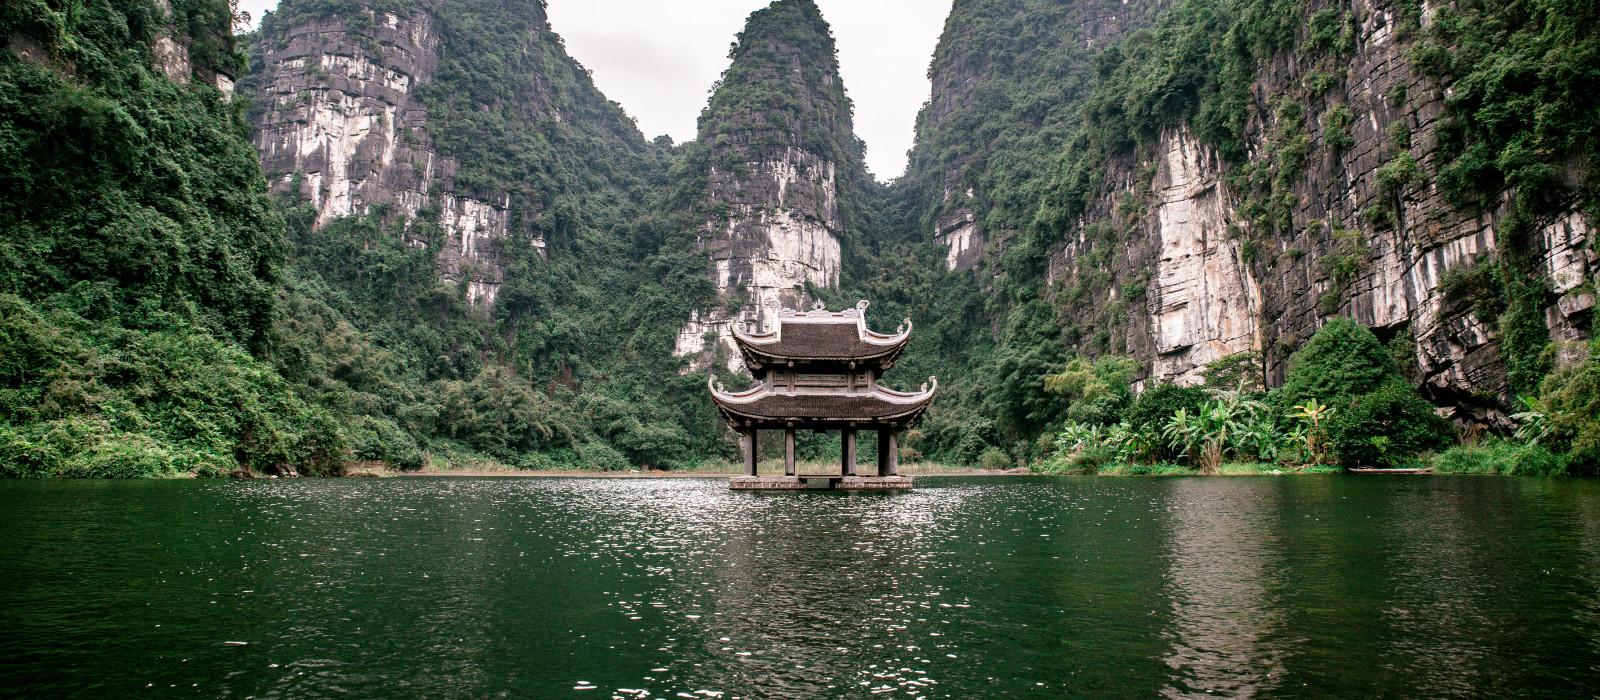 Boat cave tour in Trang, Halong Bay, Ninh Binh province, Vietnam, Asia